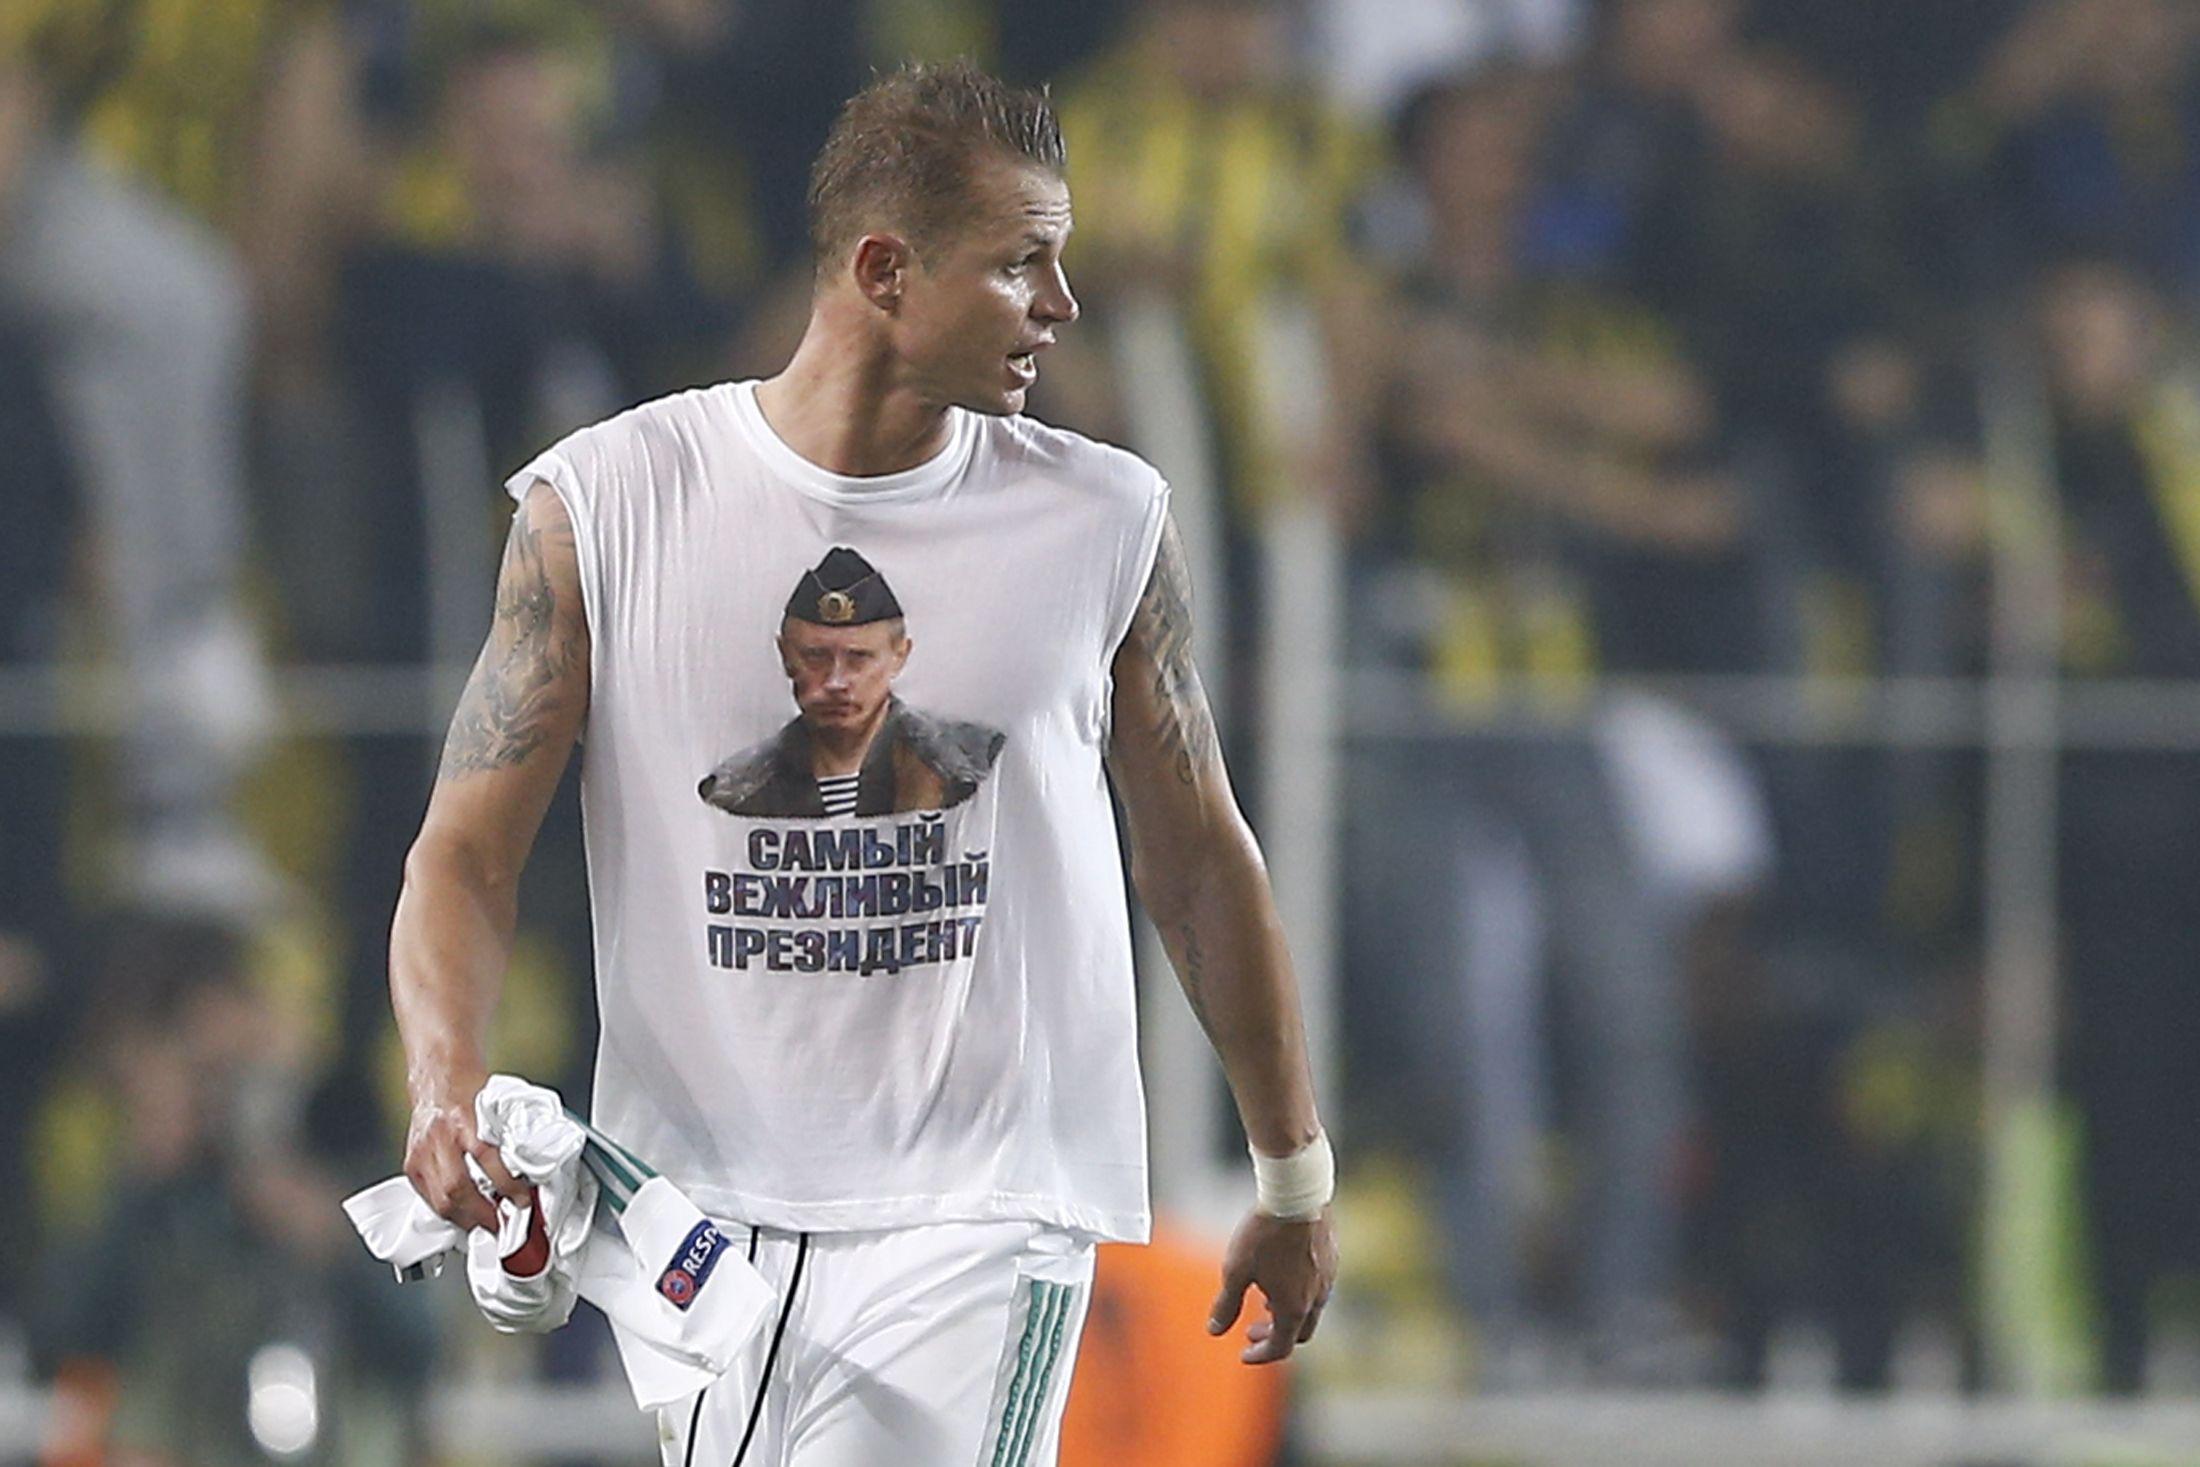 Tarasov walks off the pitch with his Putin shirt